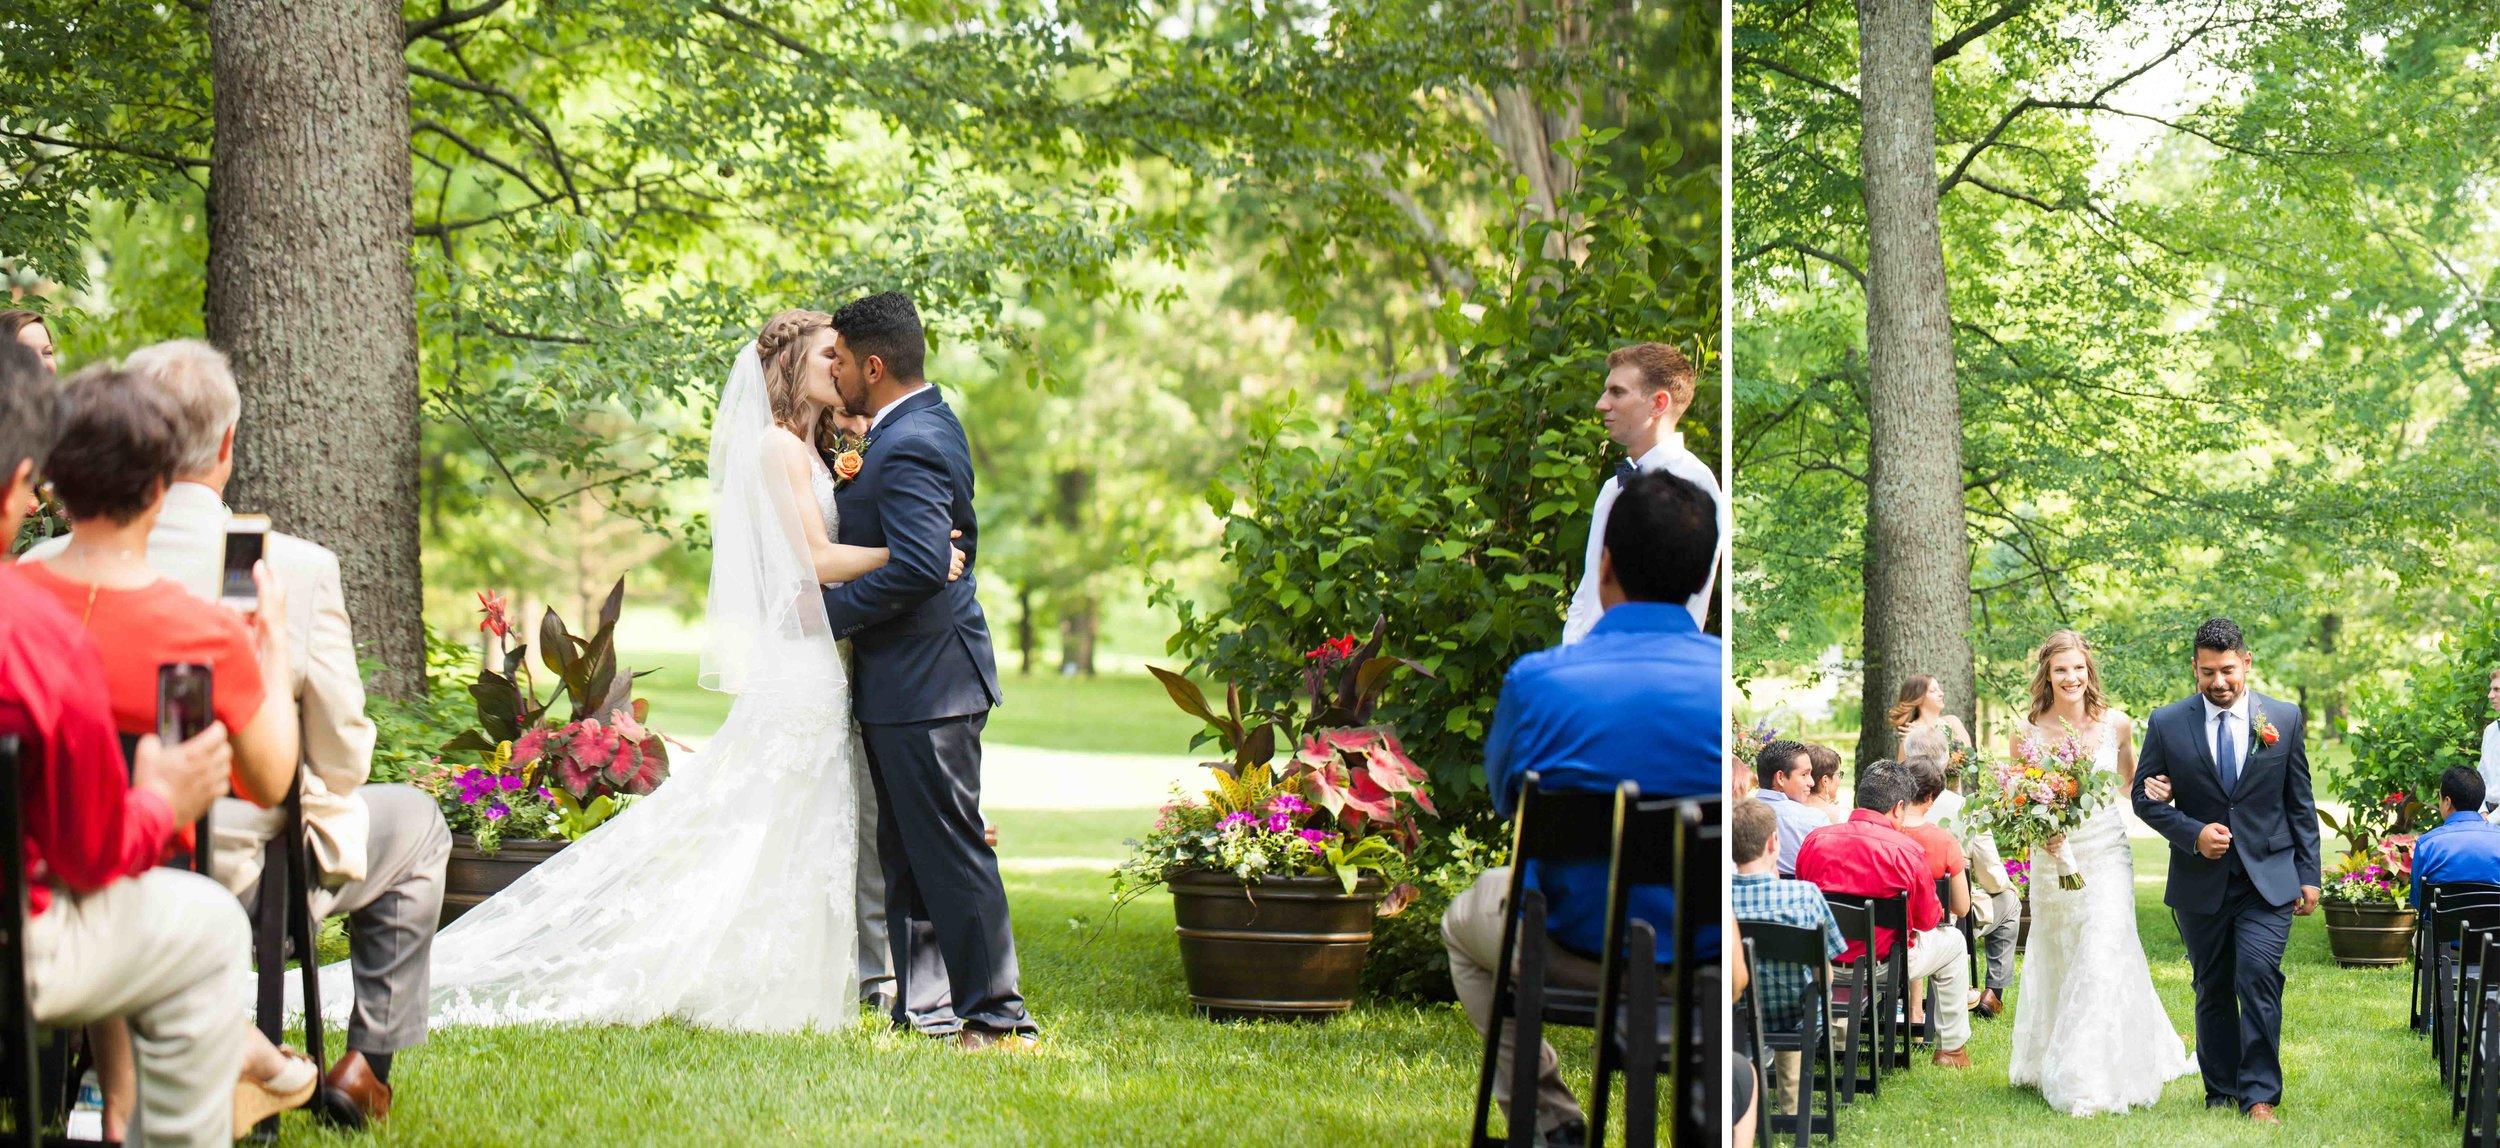 dd cincinnati wedding photographer ceremony0013.jpg